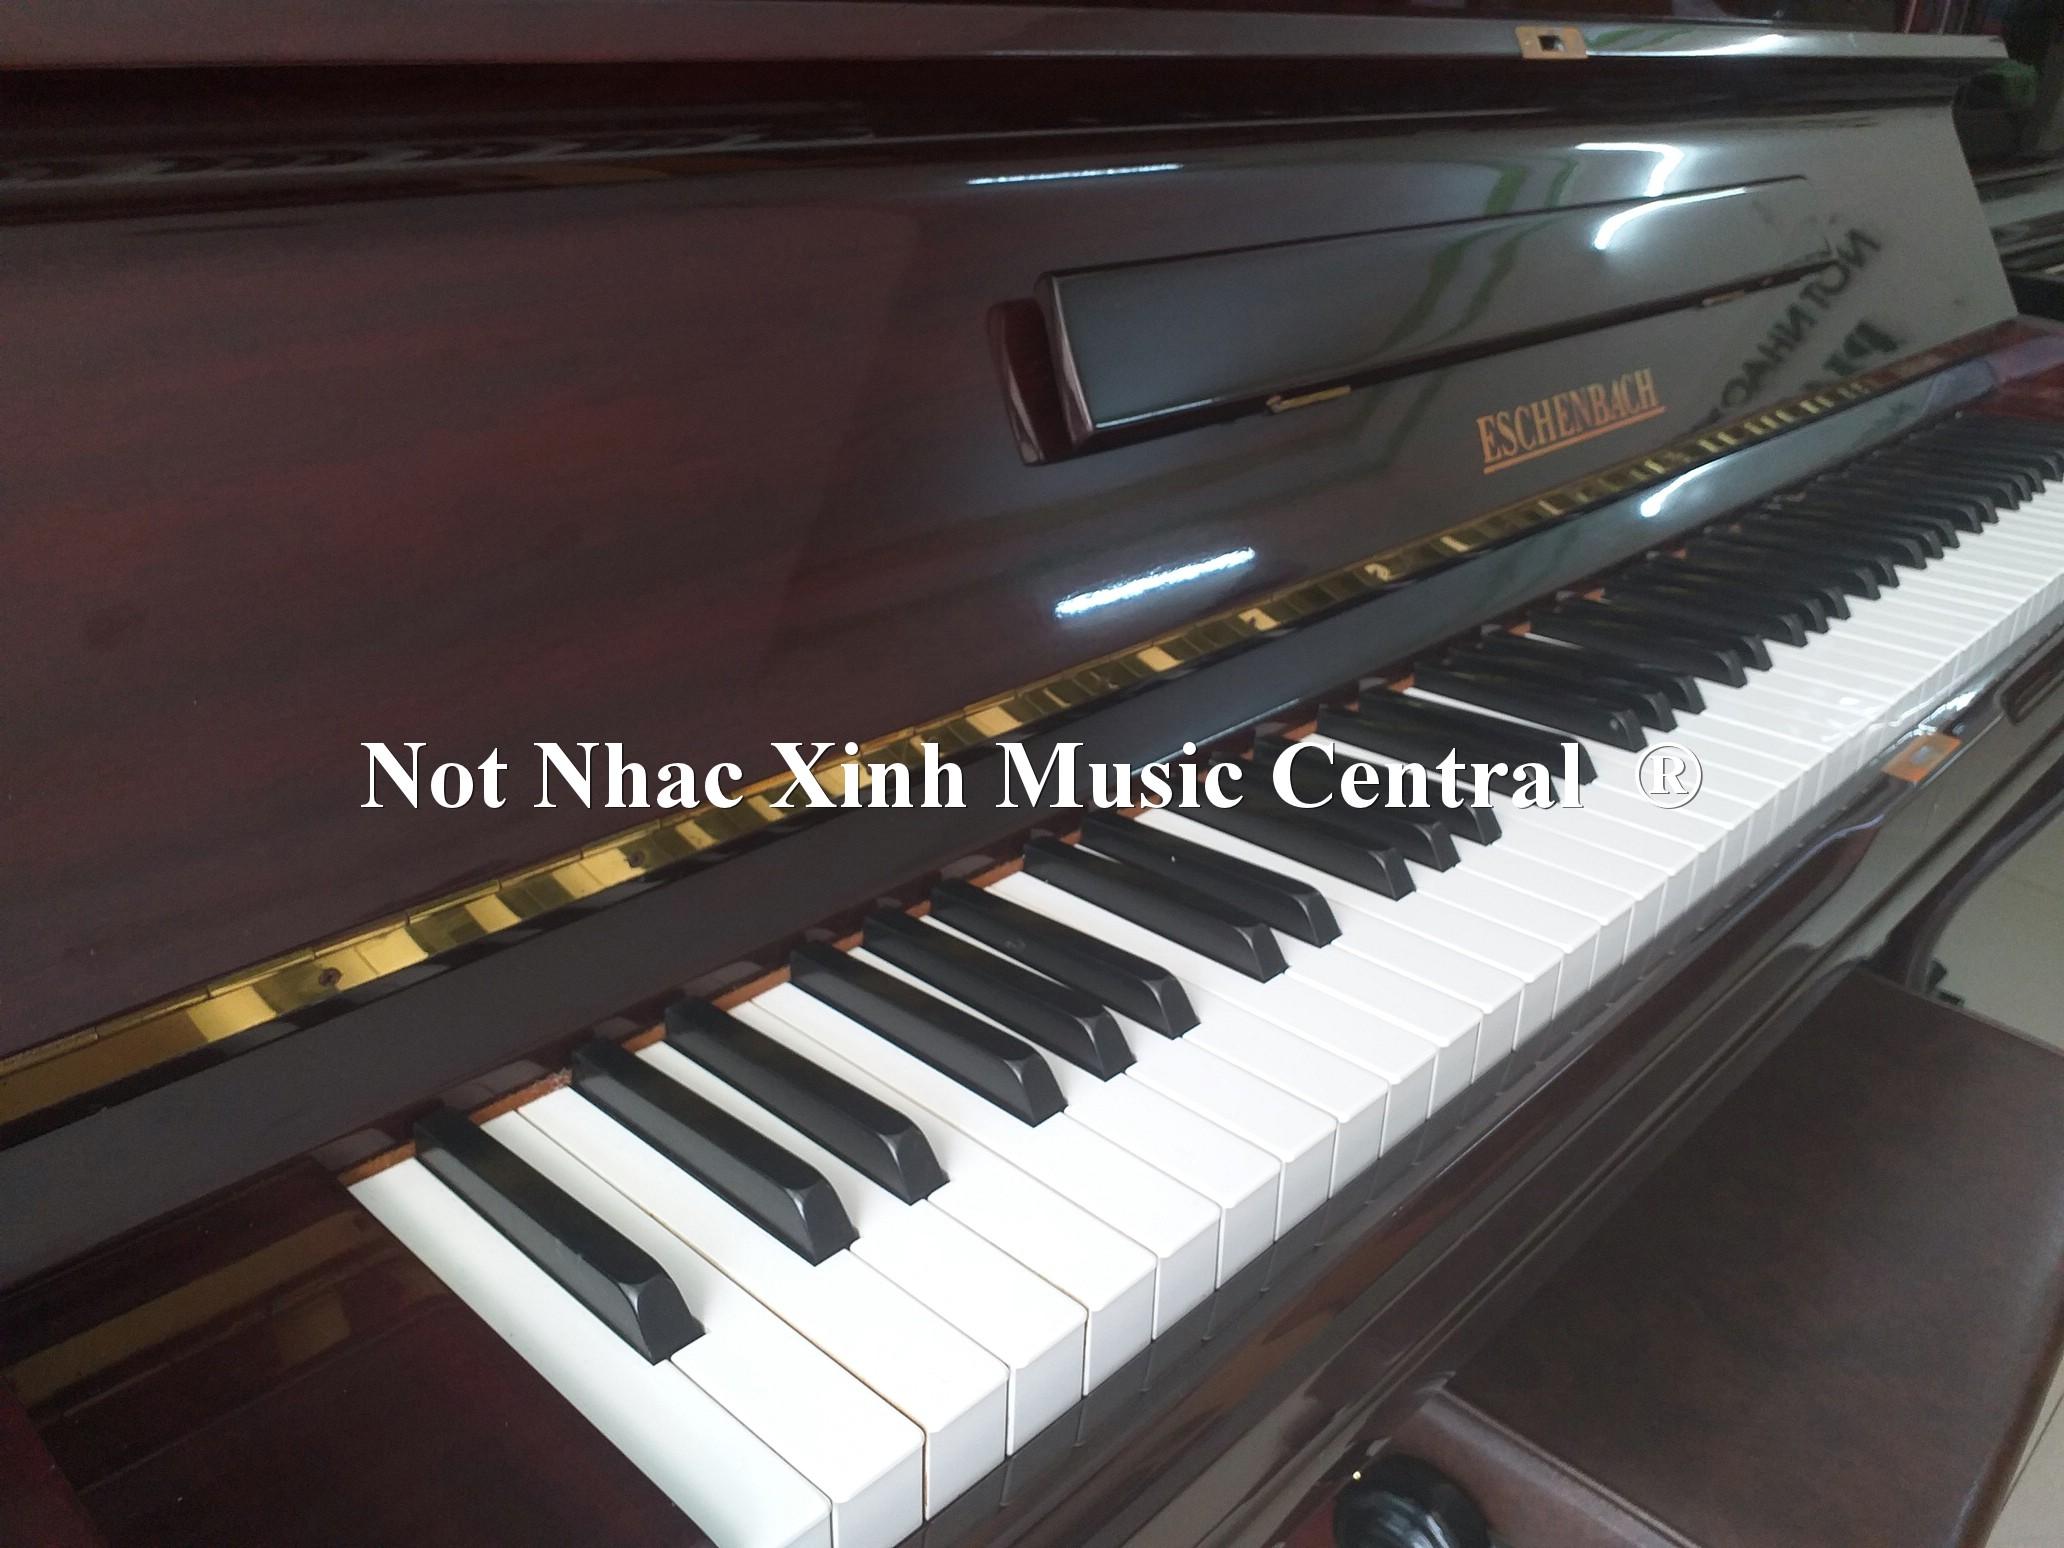 Đàn piano cơ Eschenbach U122A